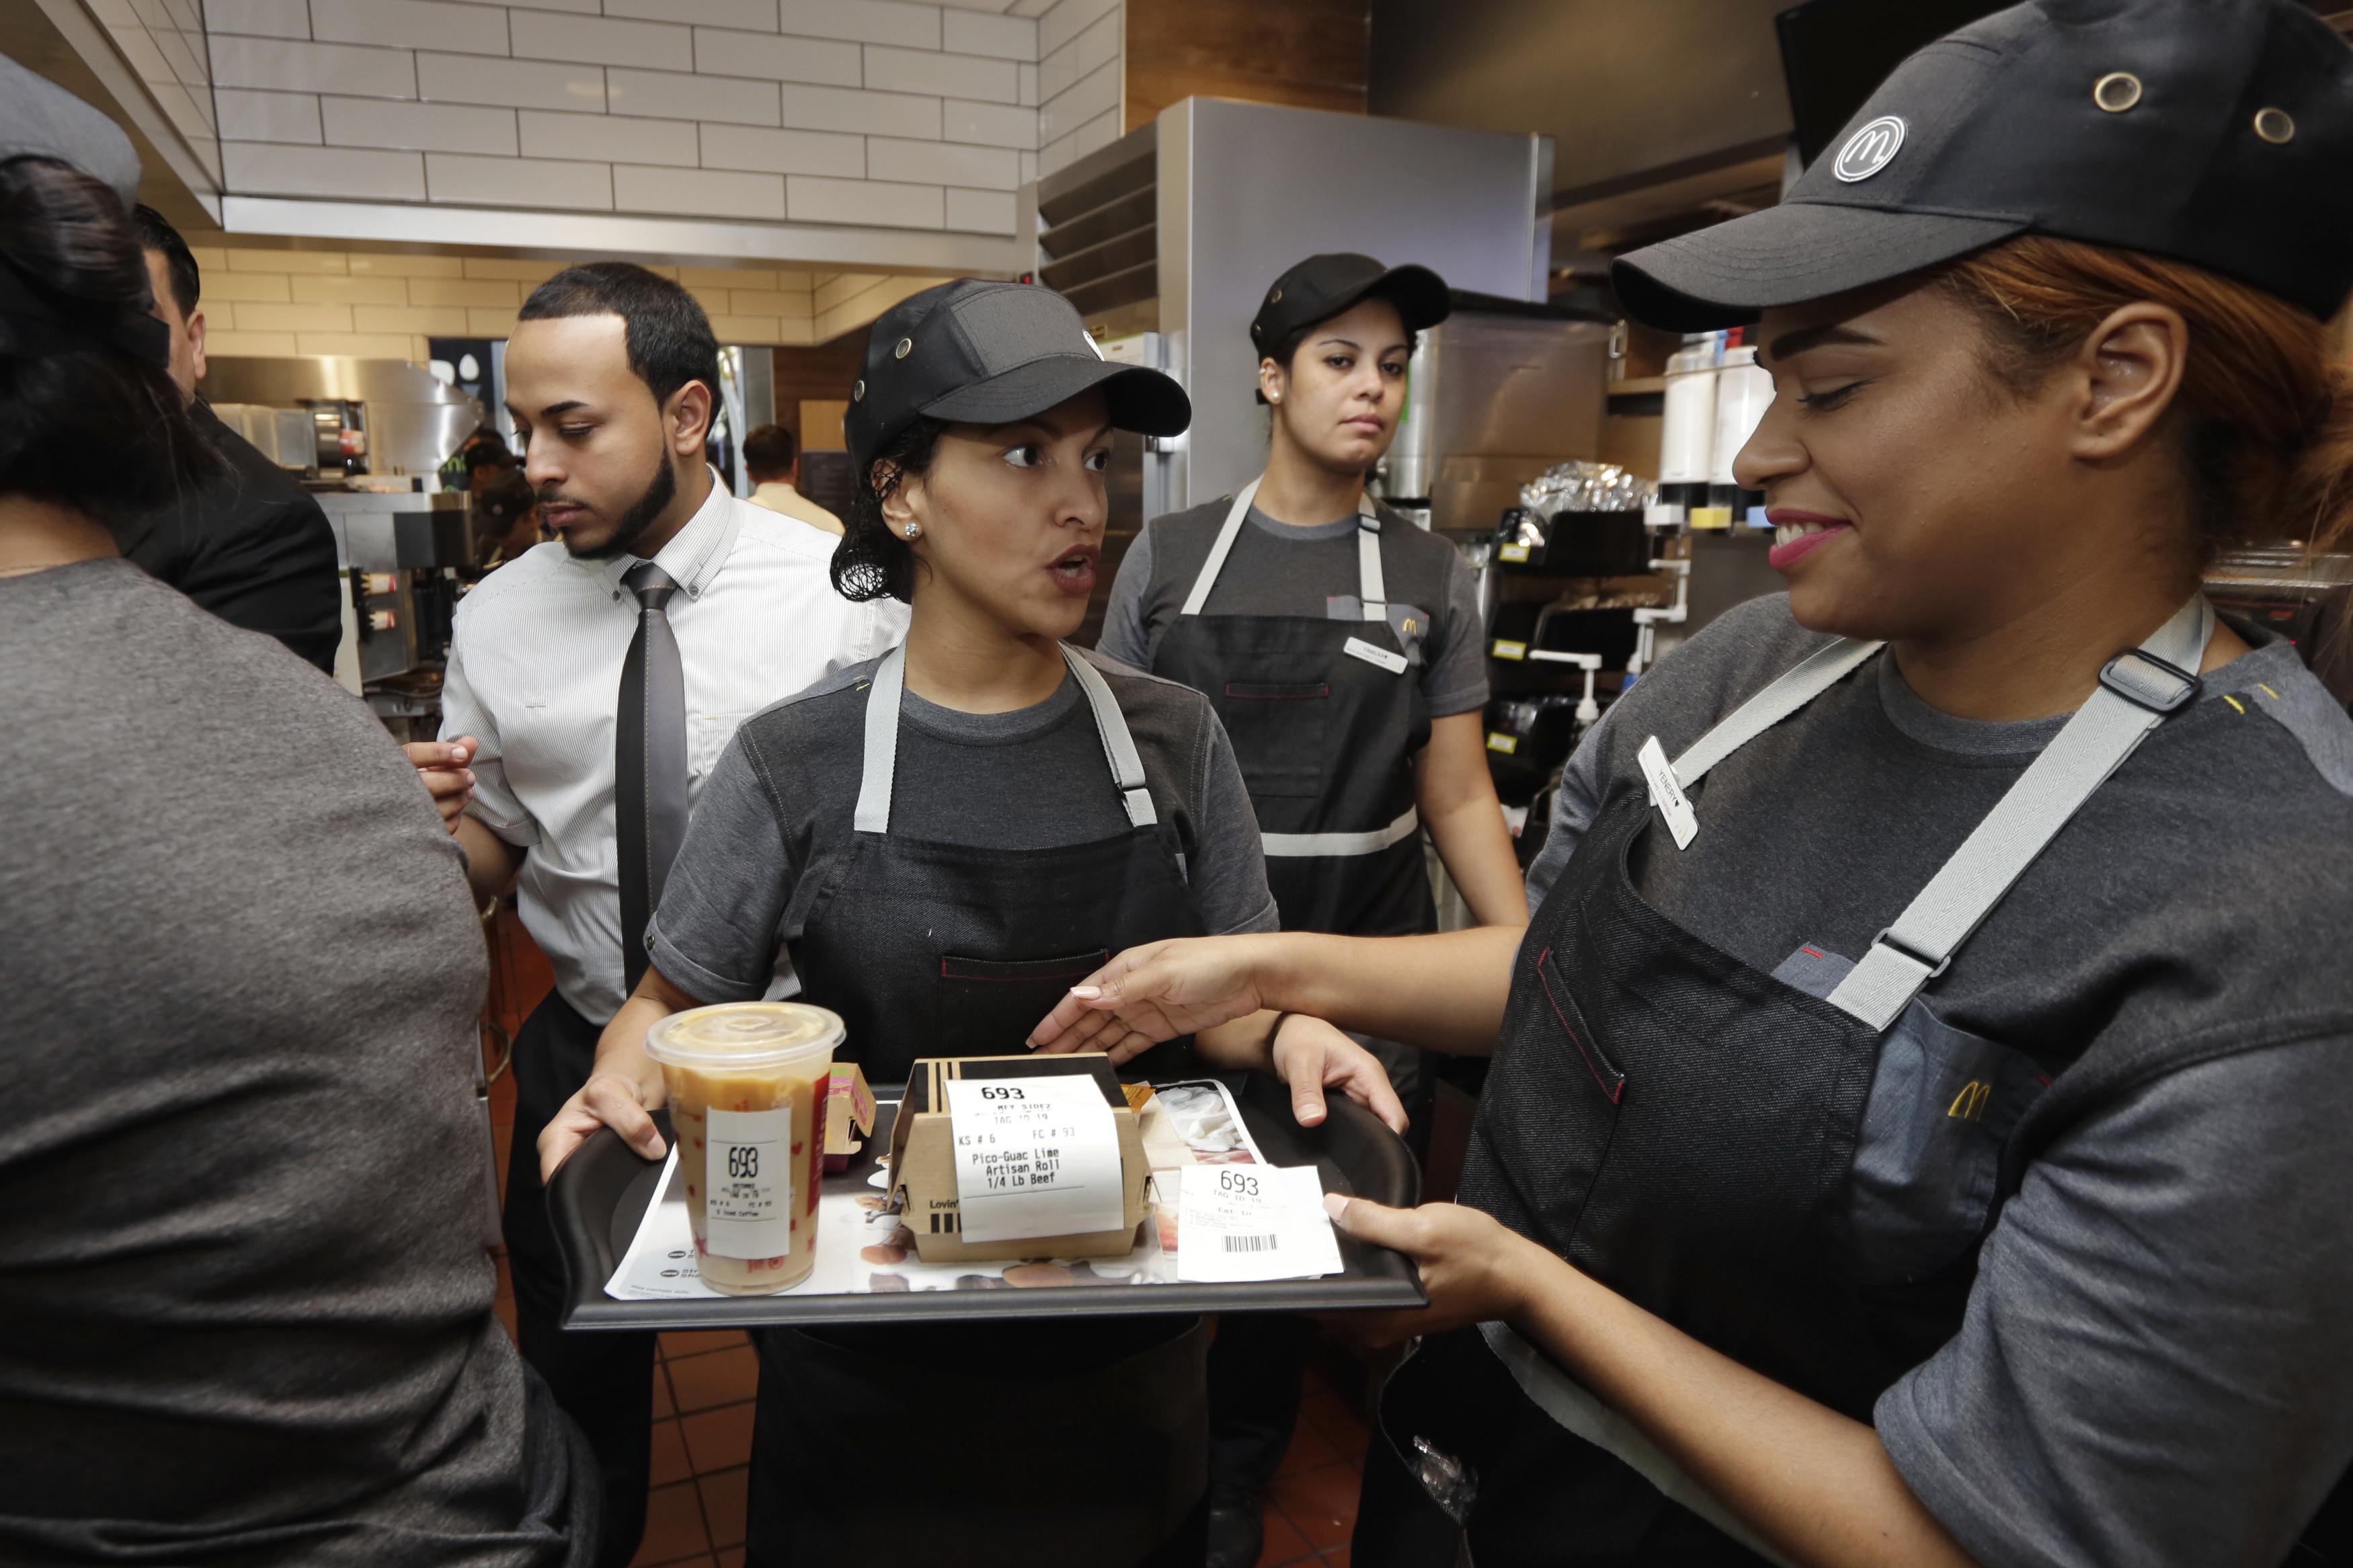 mcdonalds table service